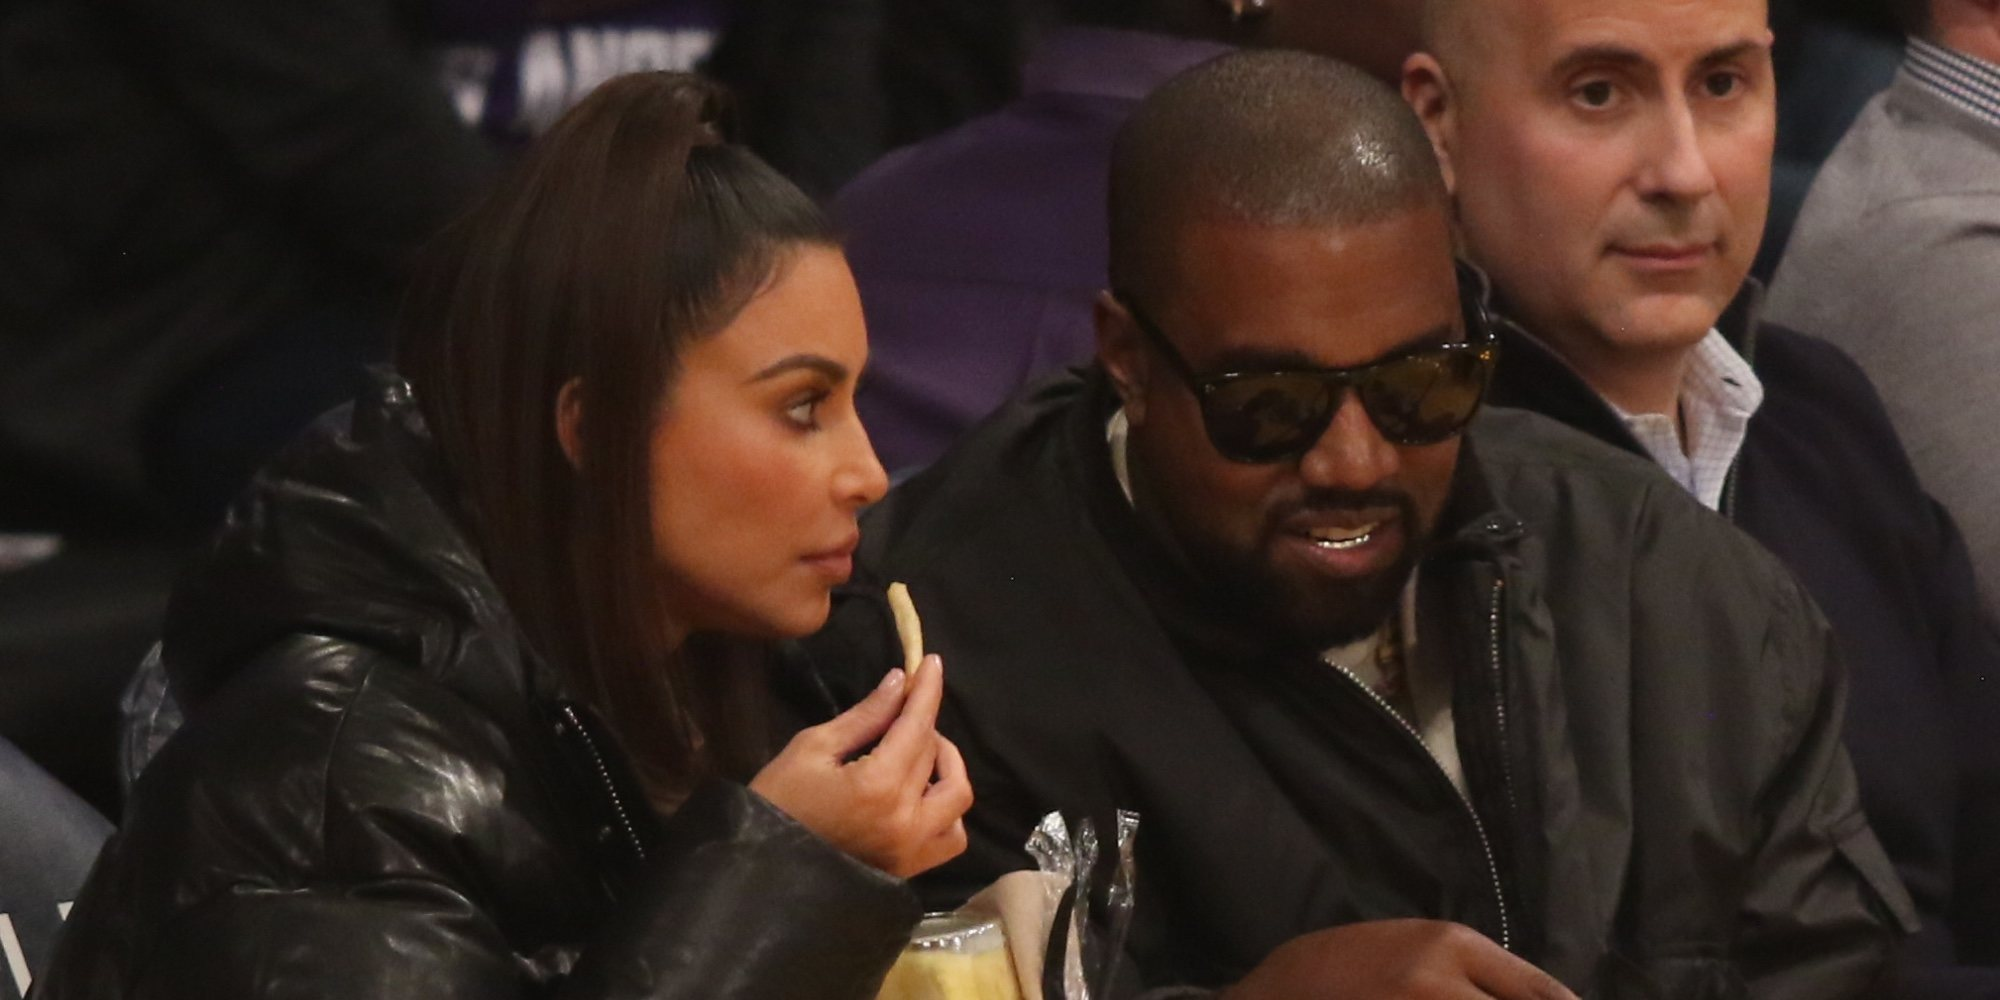 Kim Kardashian y Kanye West disfrutan de un partido de baloncesto de Tristan Thompson